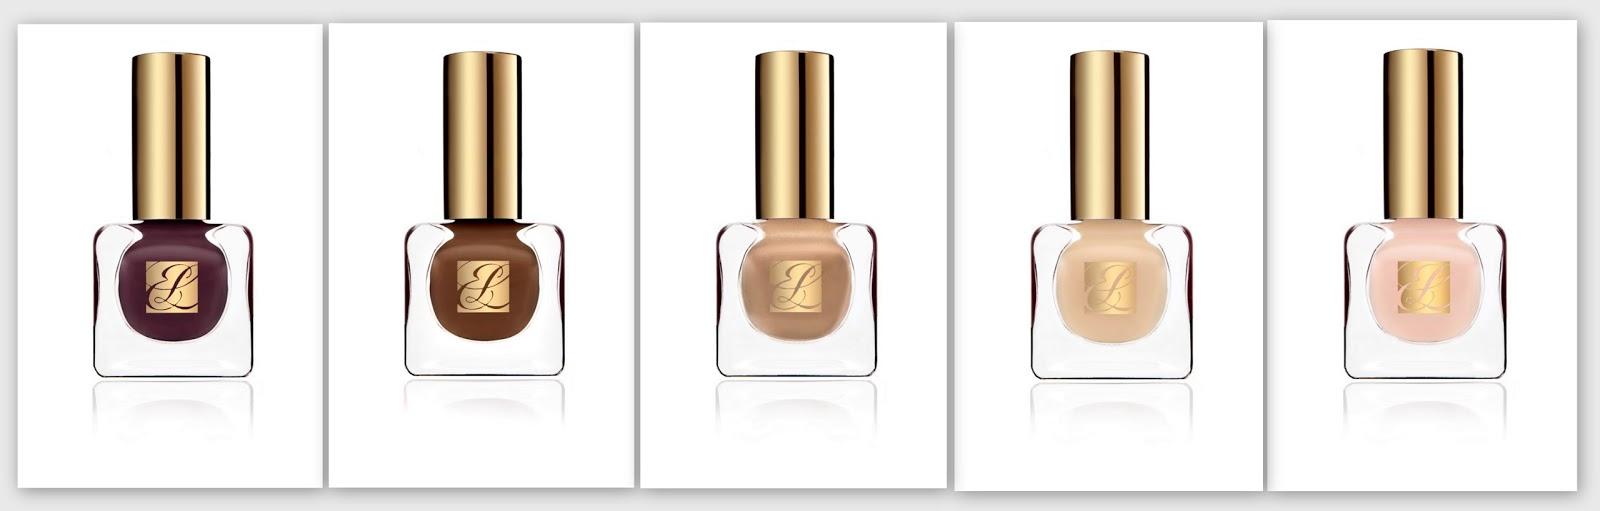 Industry News: Estée Lauder Launches French Nudes Pure Color Nail ...